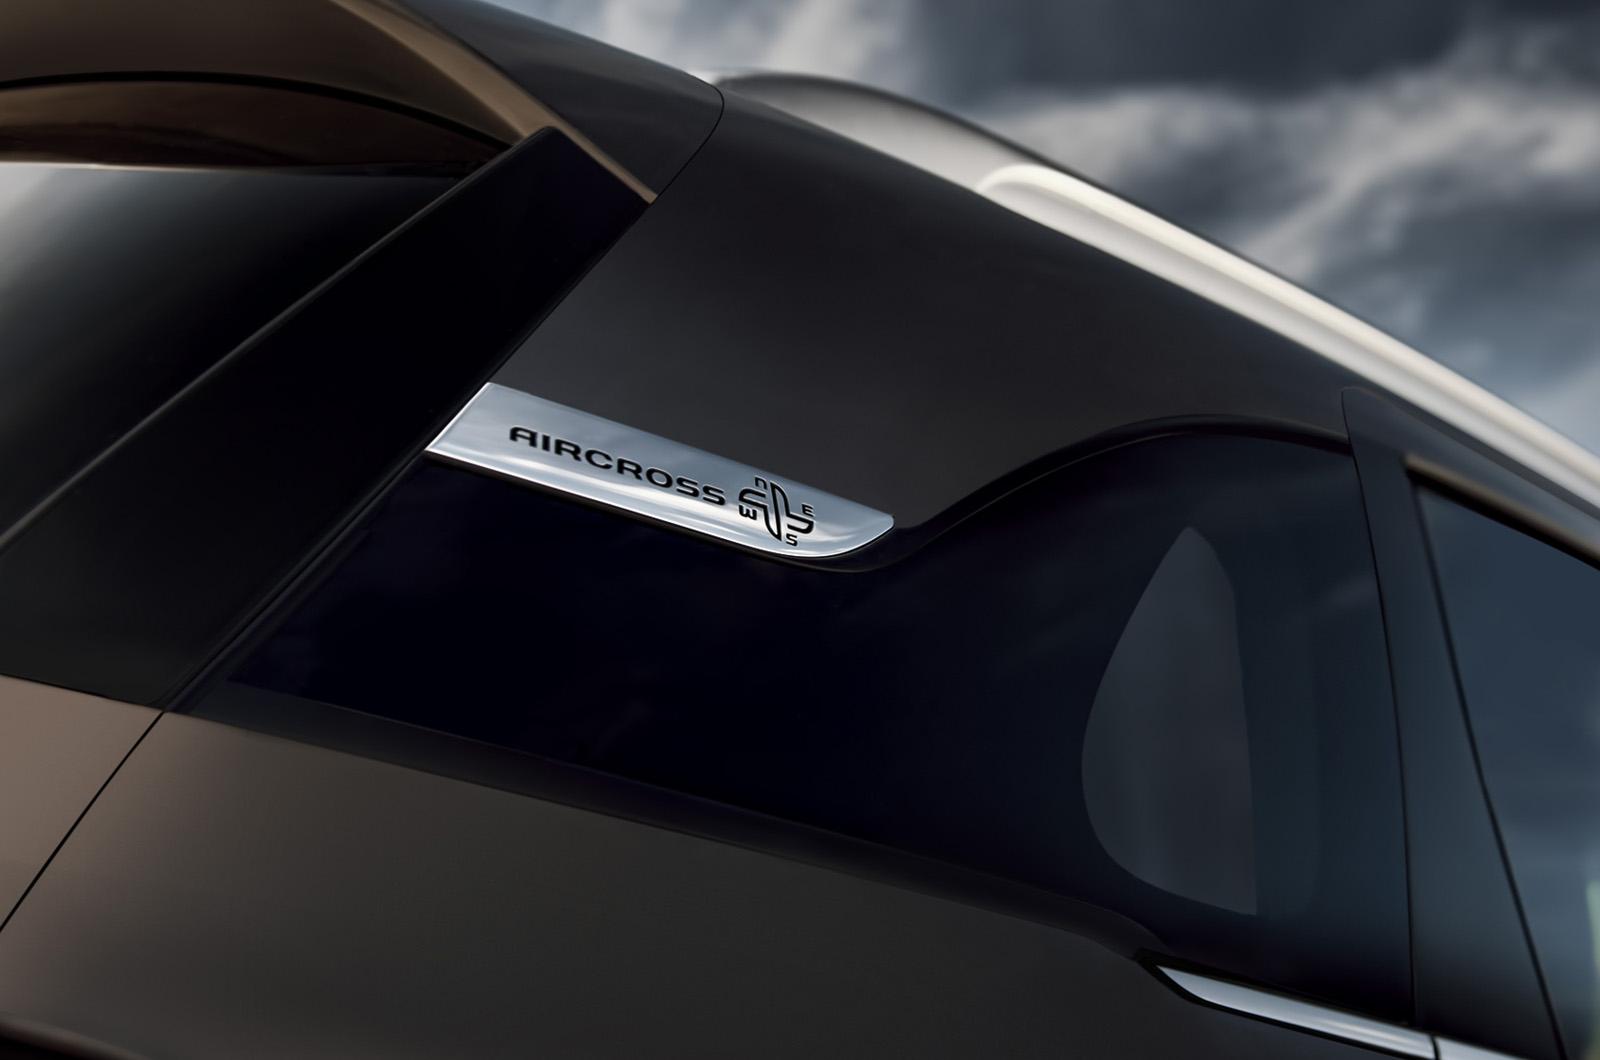 citro n c4 aircross revealed autocar. Black Bedroom Furniture Sets. Home Design Ideas